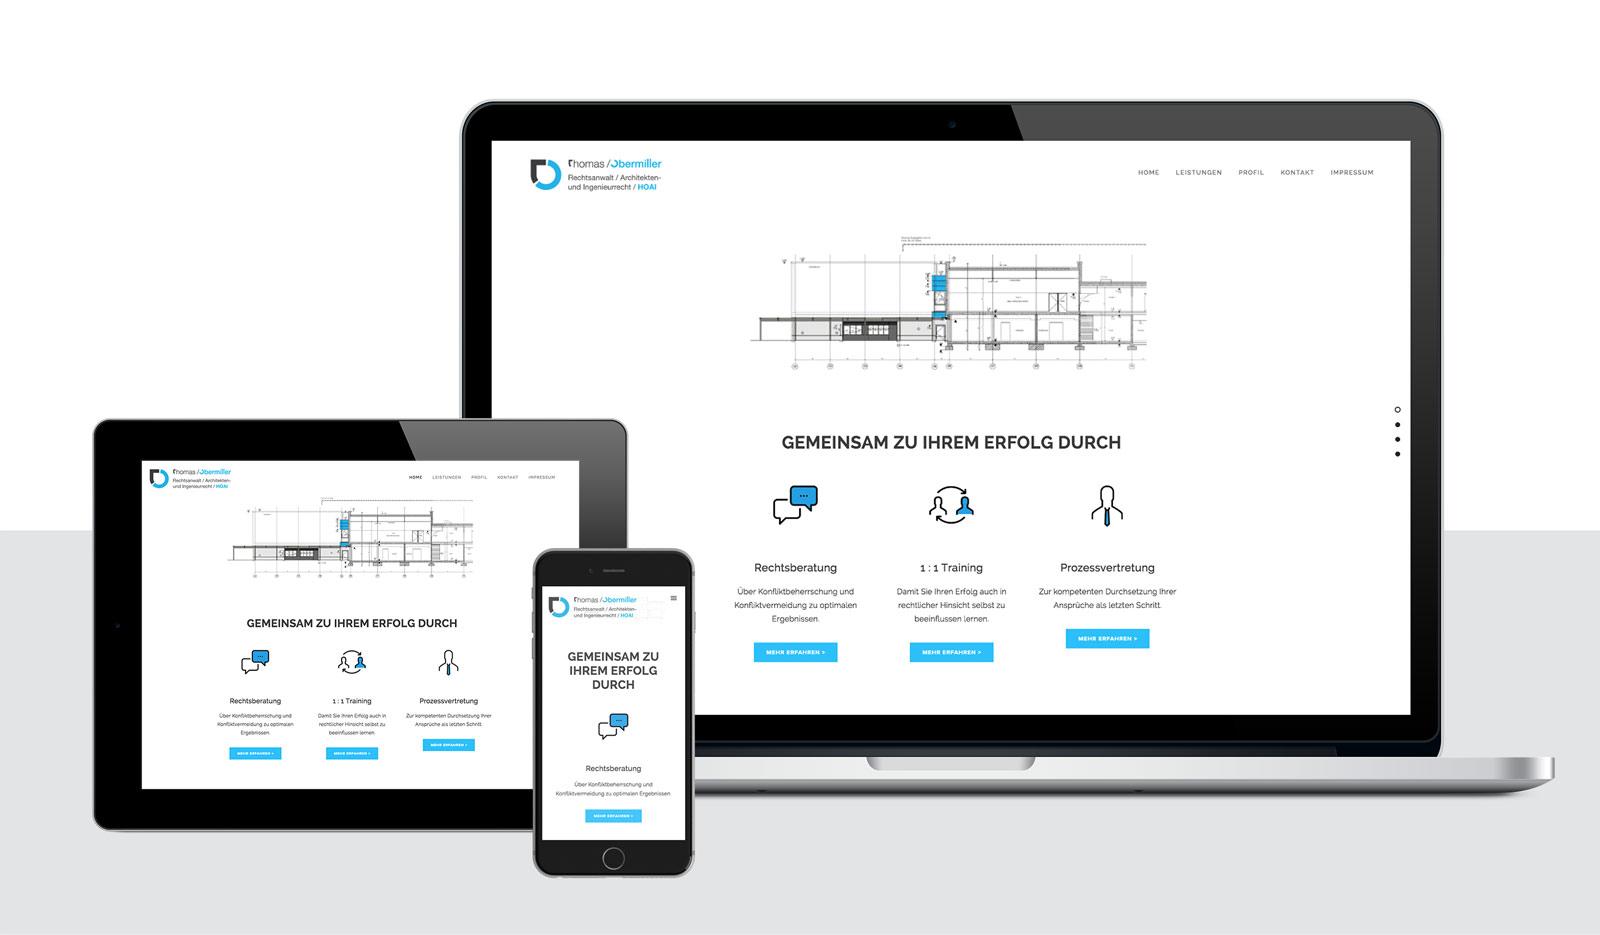 Obermiller_Responsive_Webdesign_6.jpg